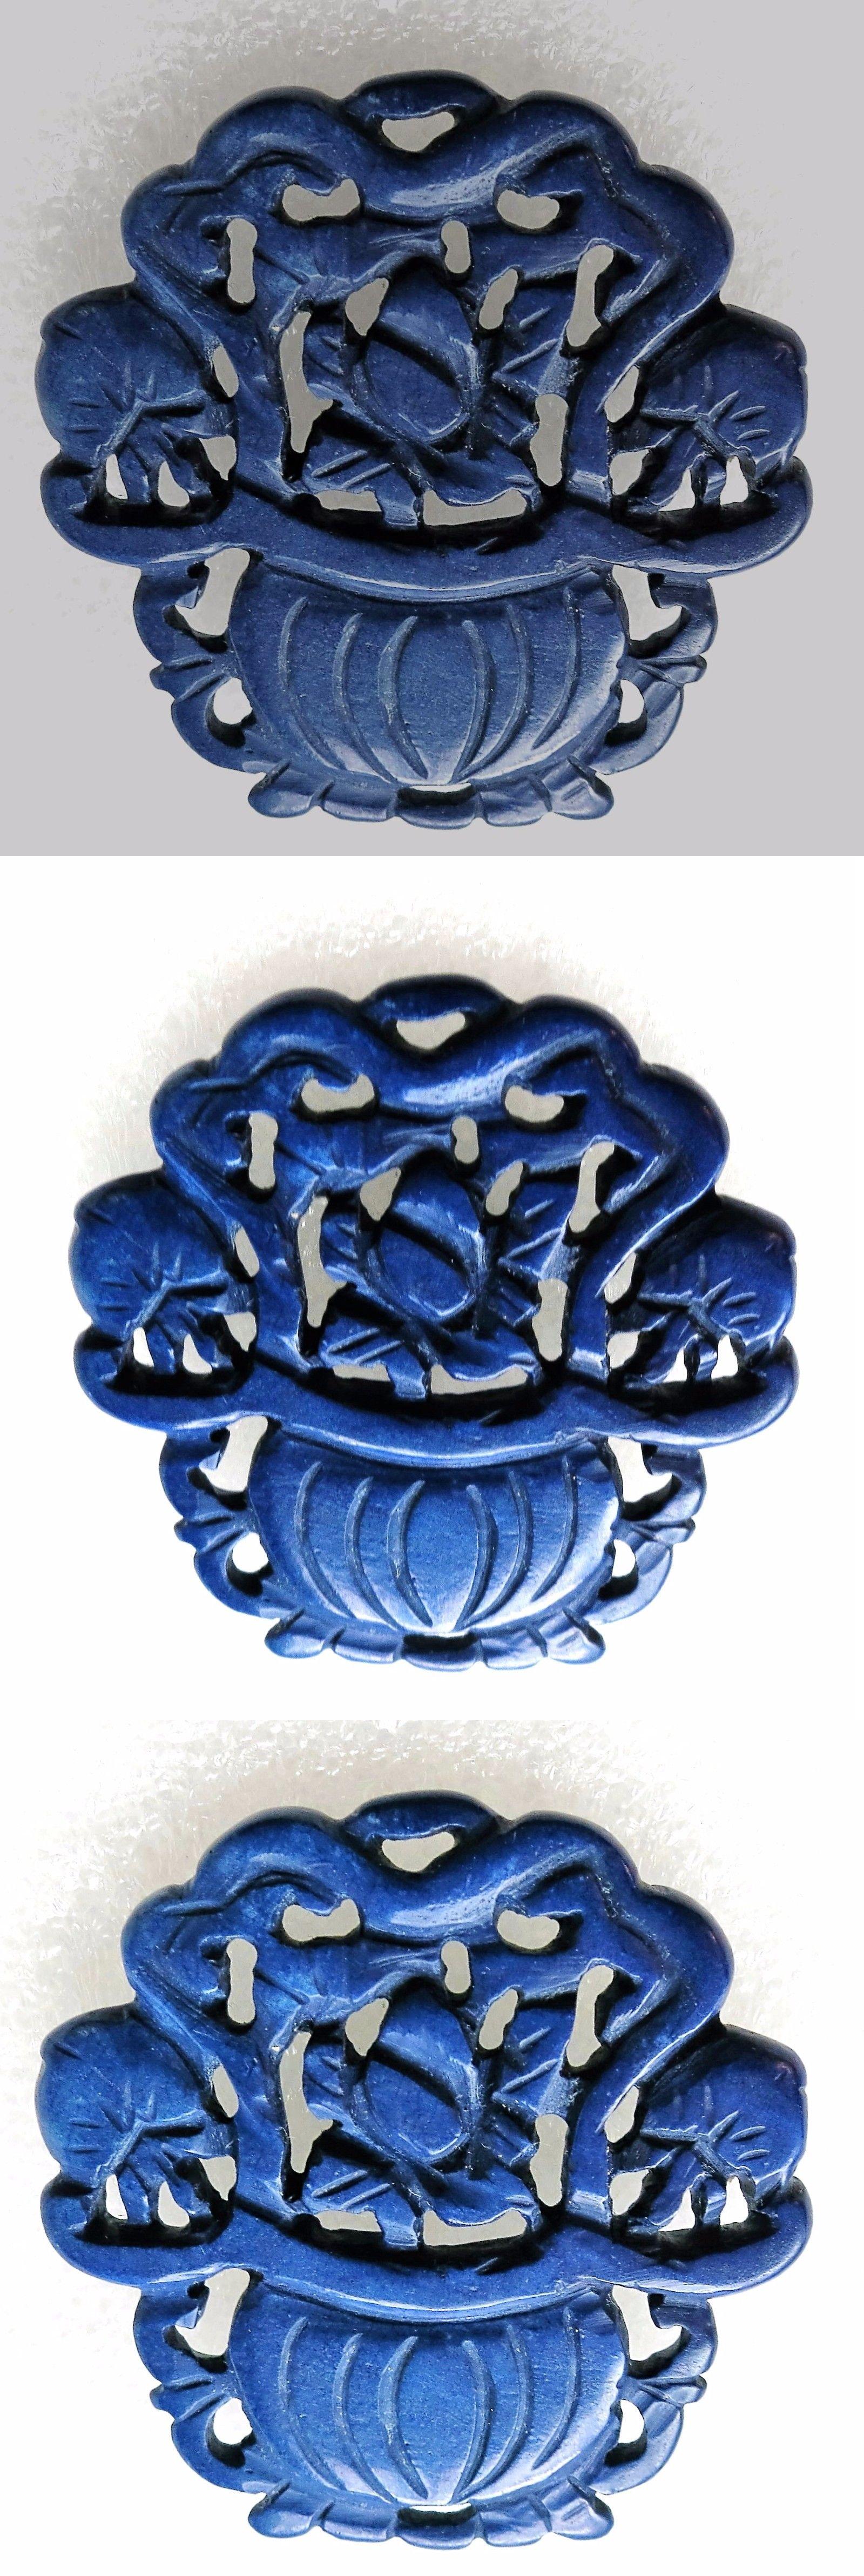 Vintage 3811: Huge Vintage Chinese Carved Blue Jade Flower Basket Pendant 52X50mm BUY IT NOW ONLY: $35.1